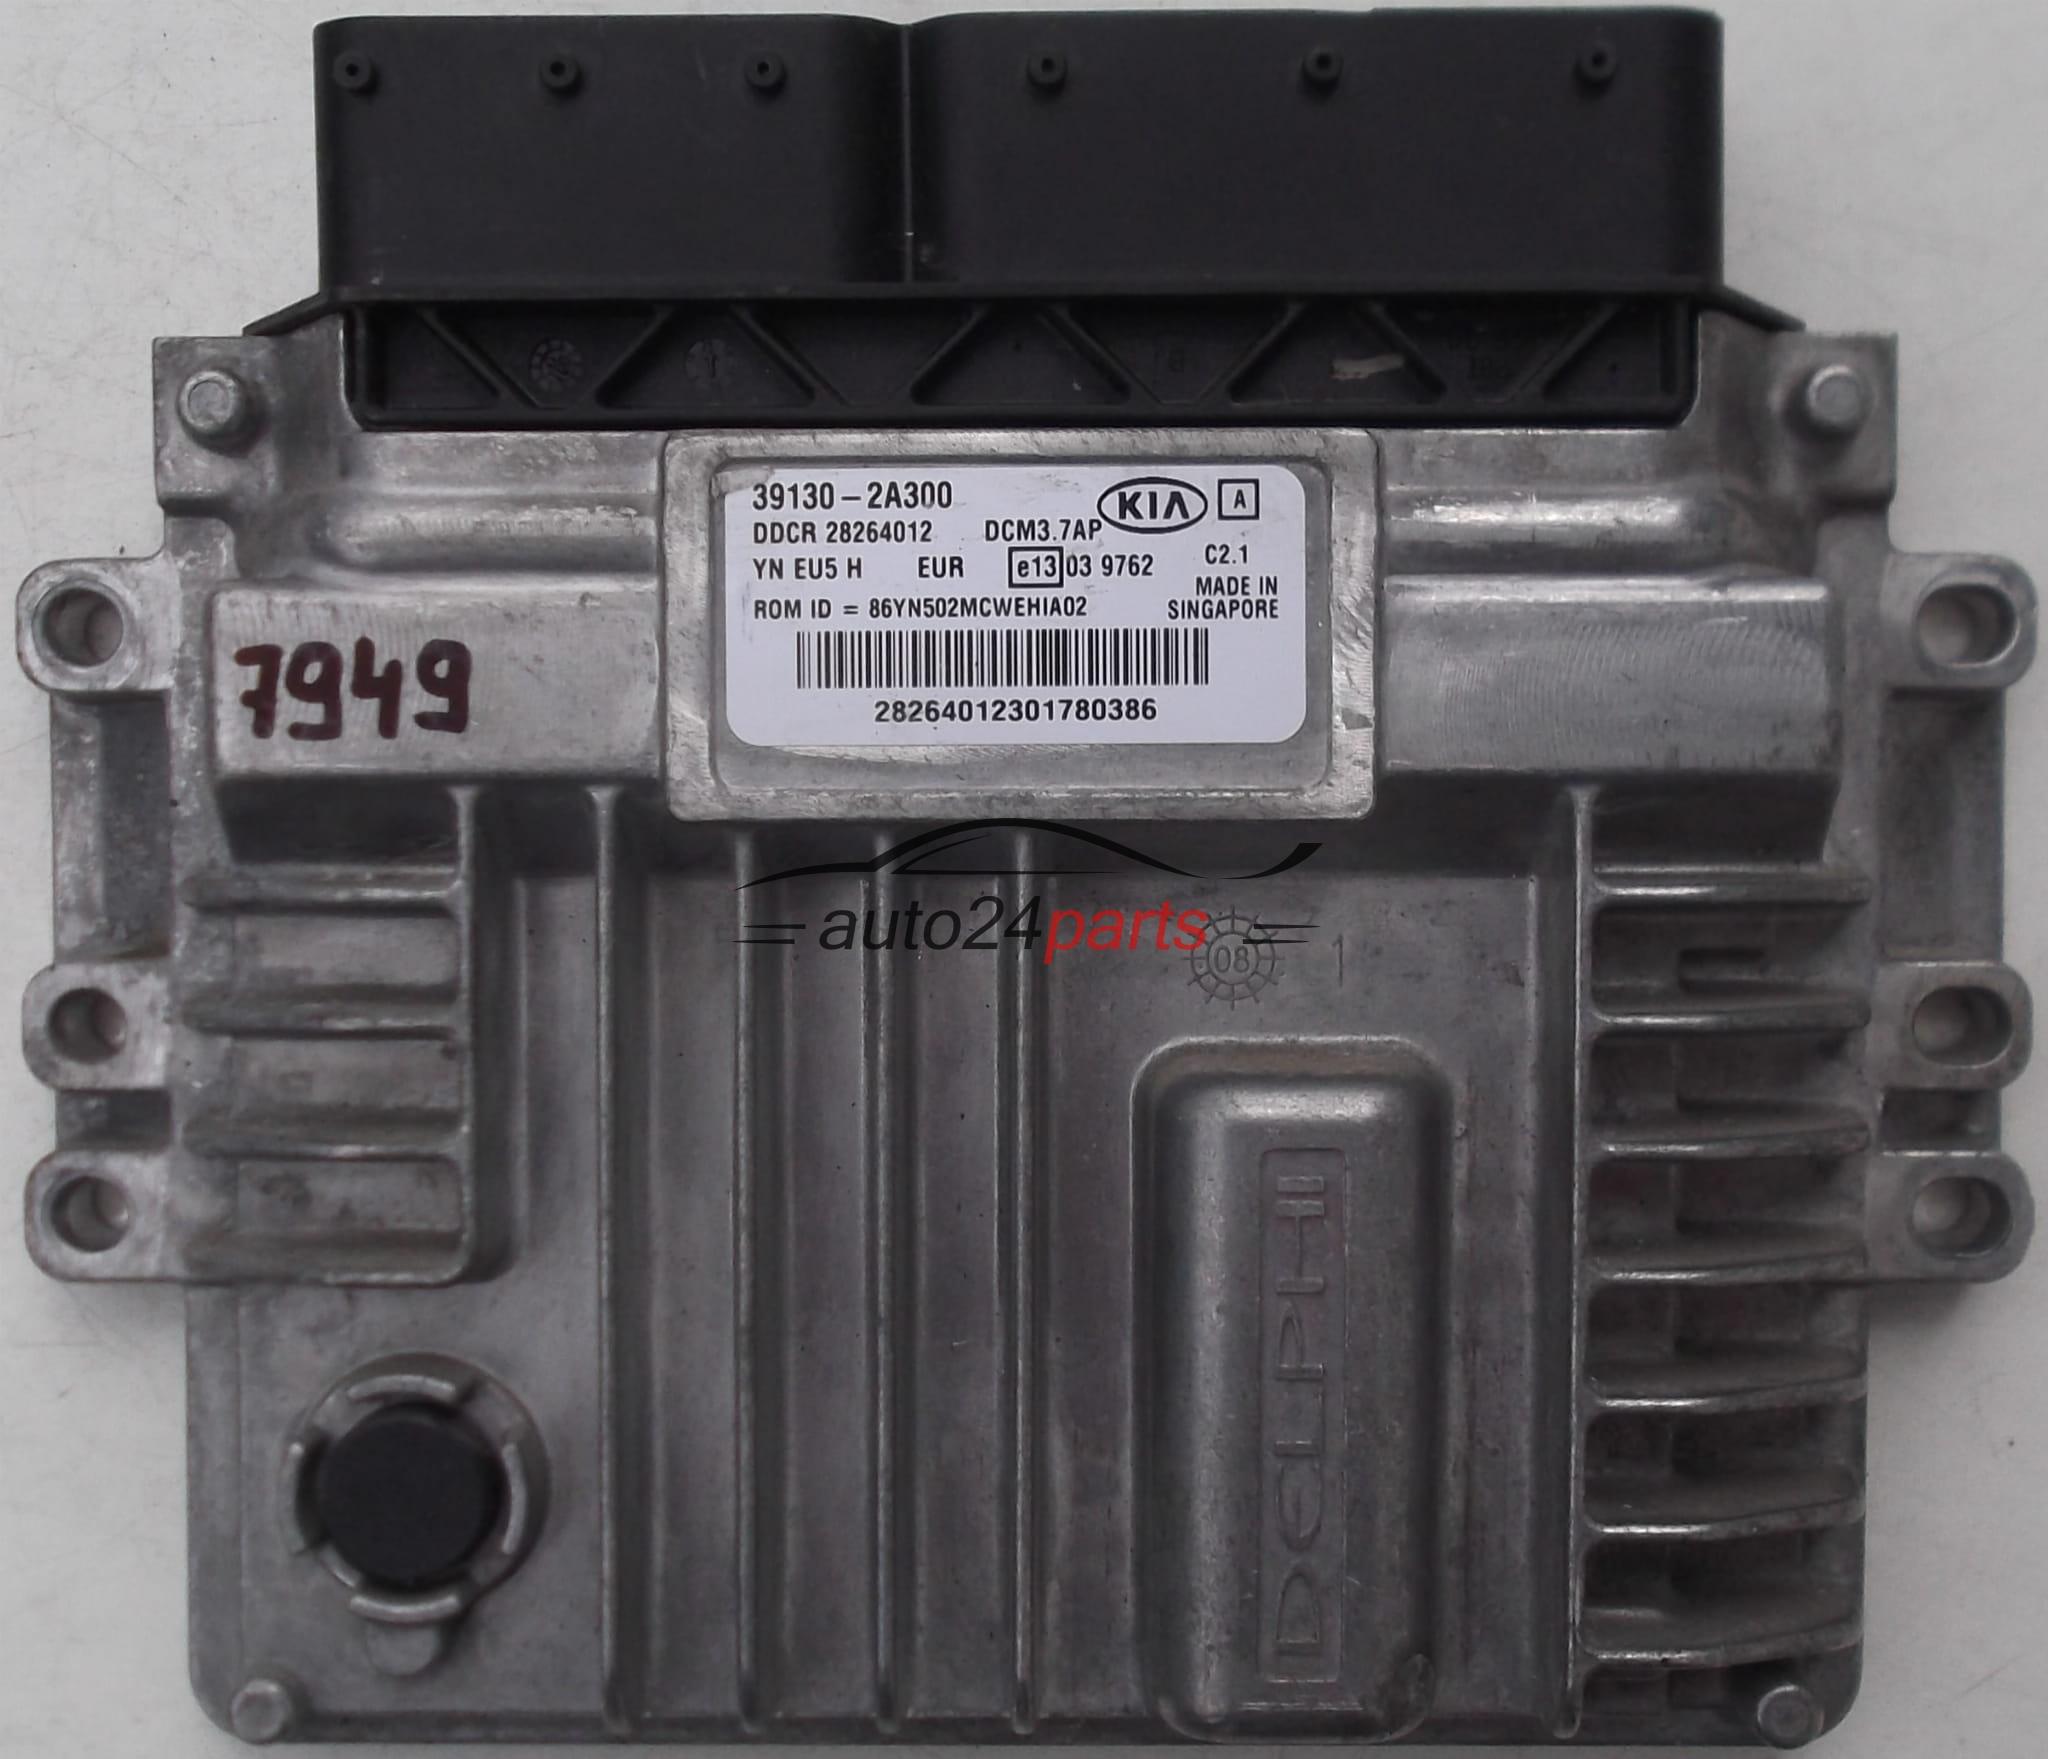 ECU ENGINE CONTROLLER KIA VENGA 1 4 CRDI, 39130-2A300, 391302A300,  DDCR28264012, DCM3 7AP